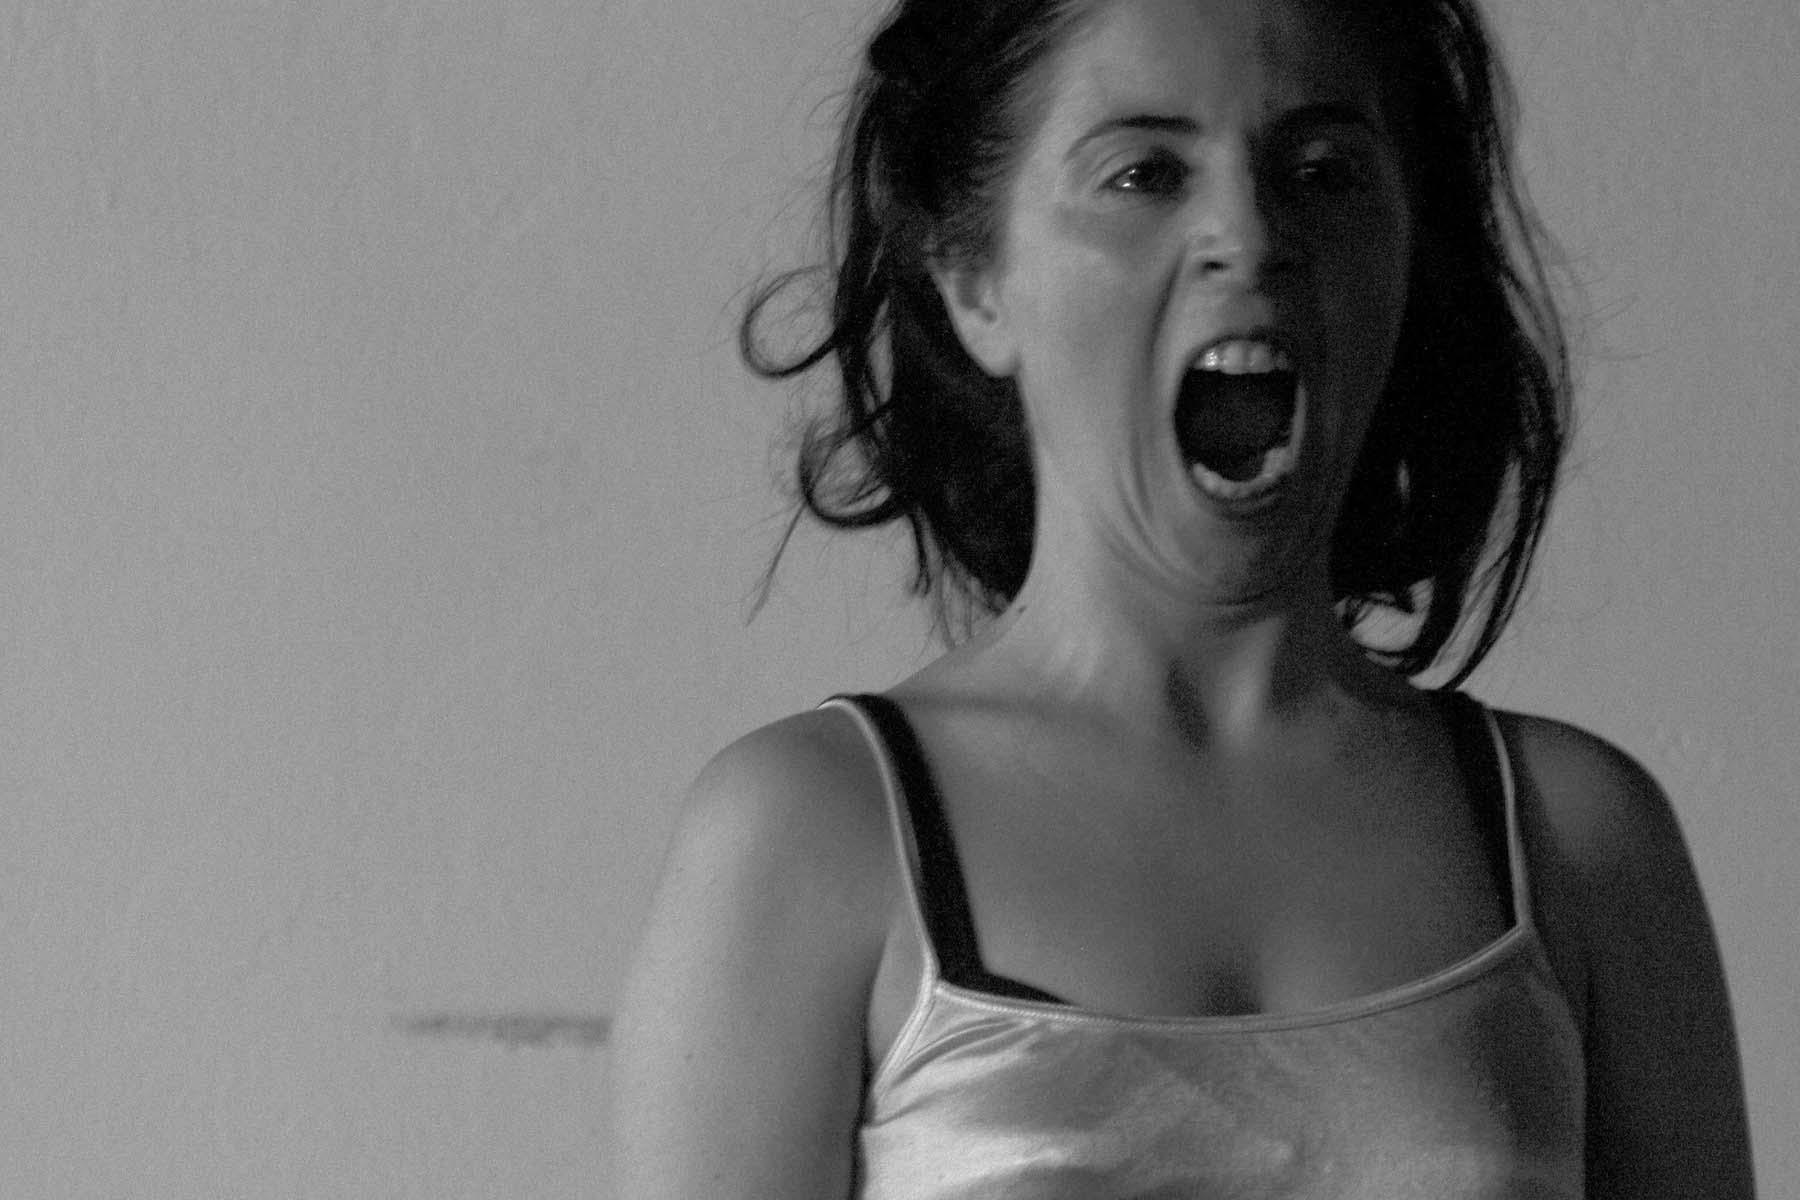 ANA BORRALHO & JOÃO GALANTE - Artist Screams